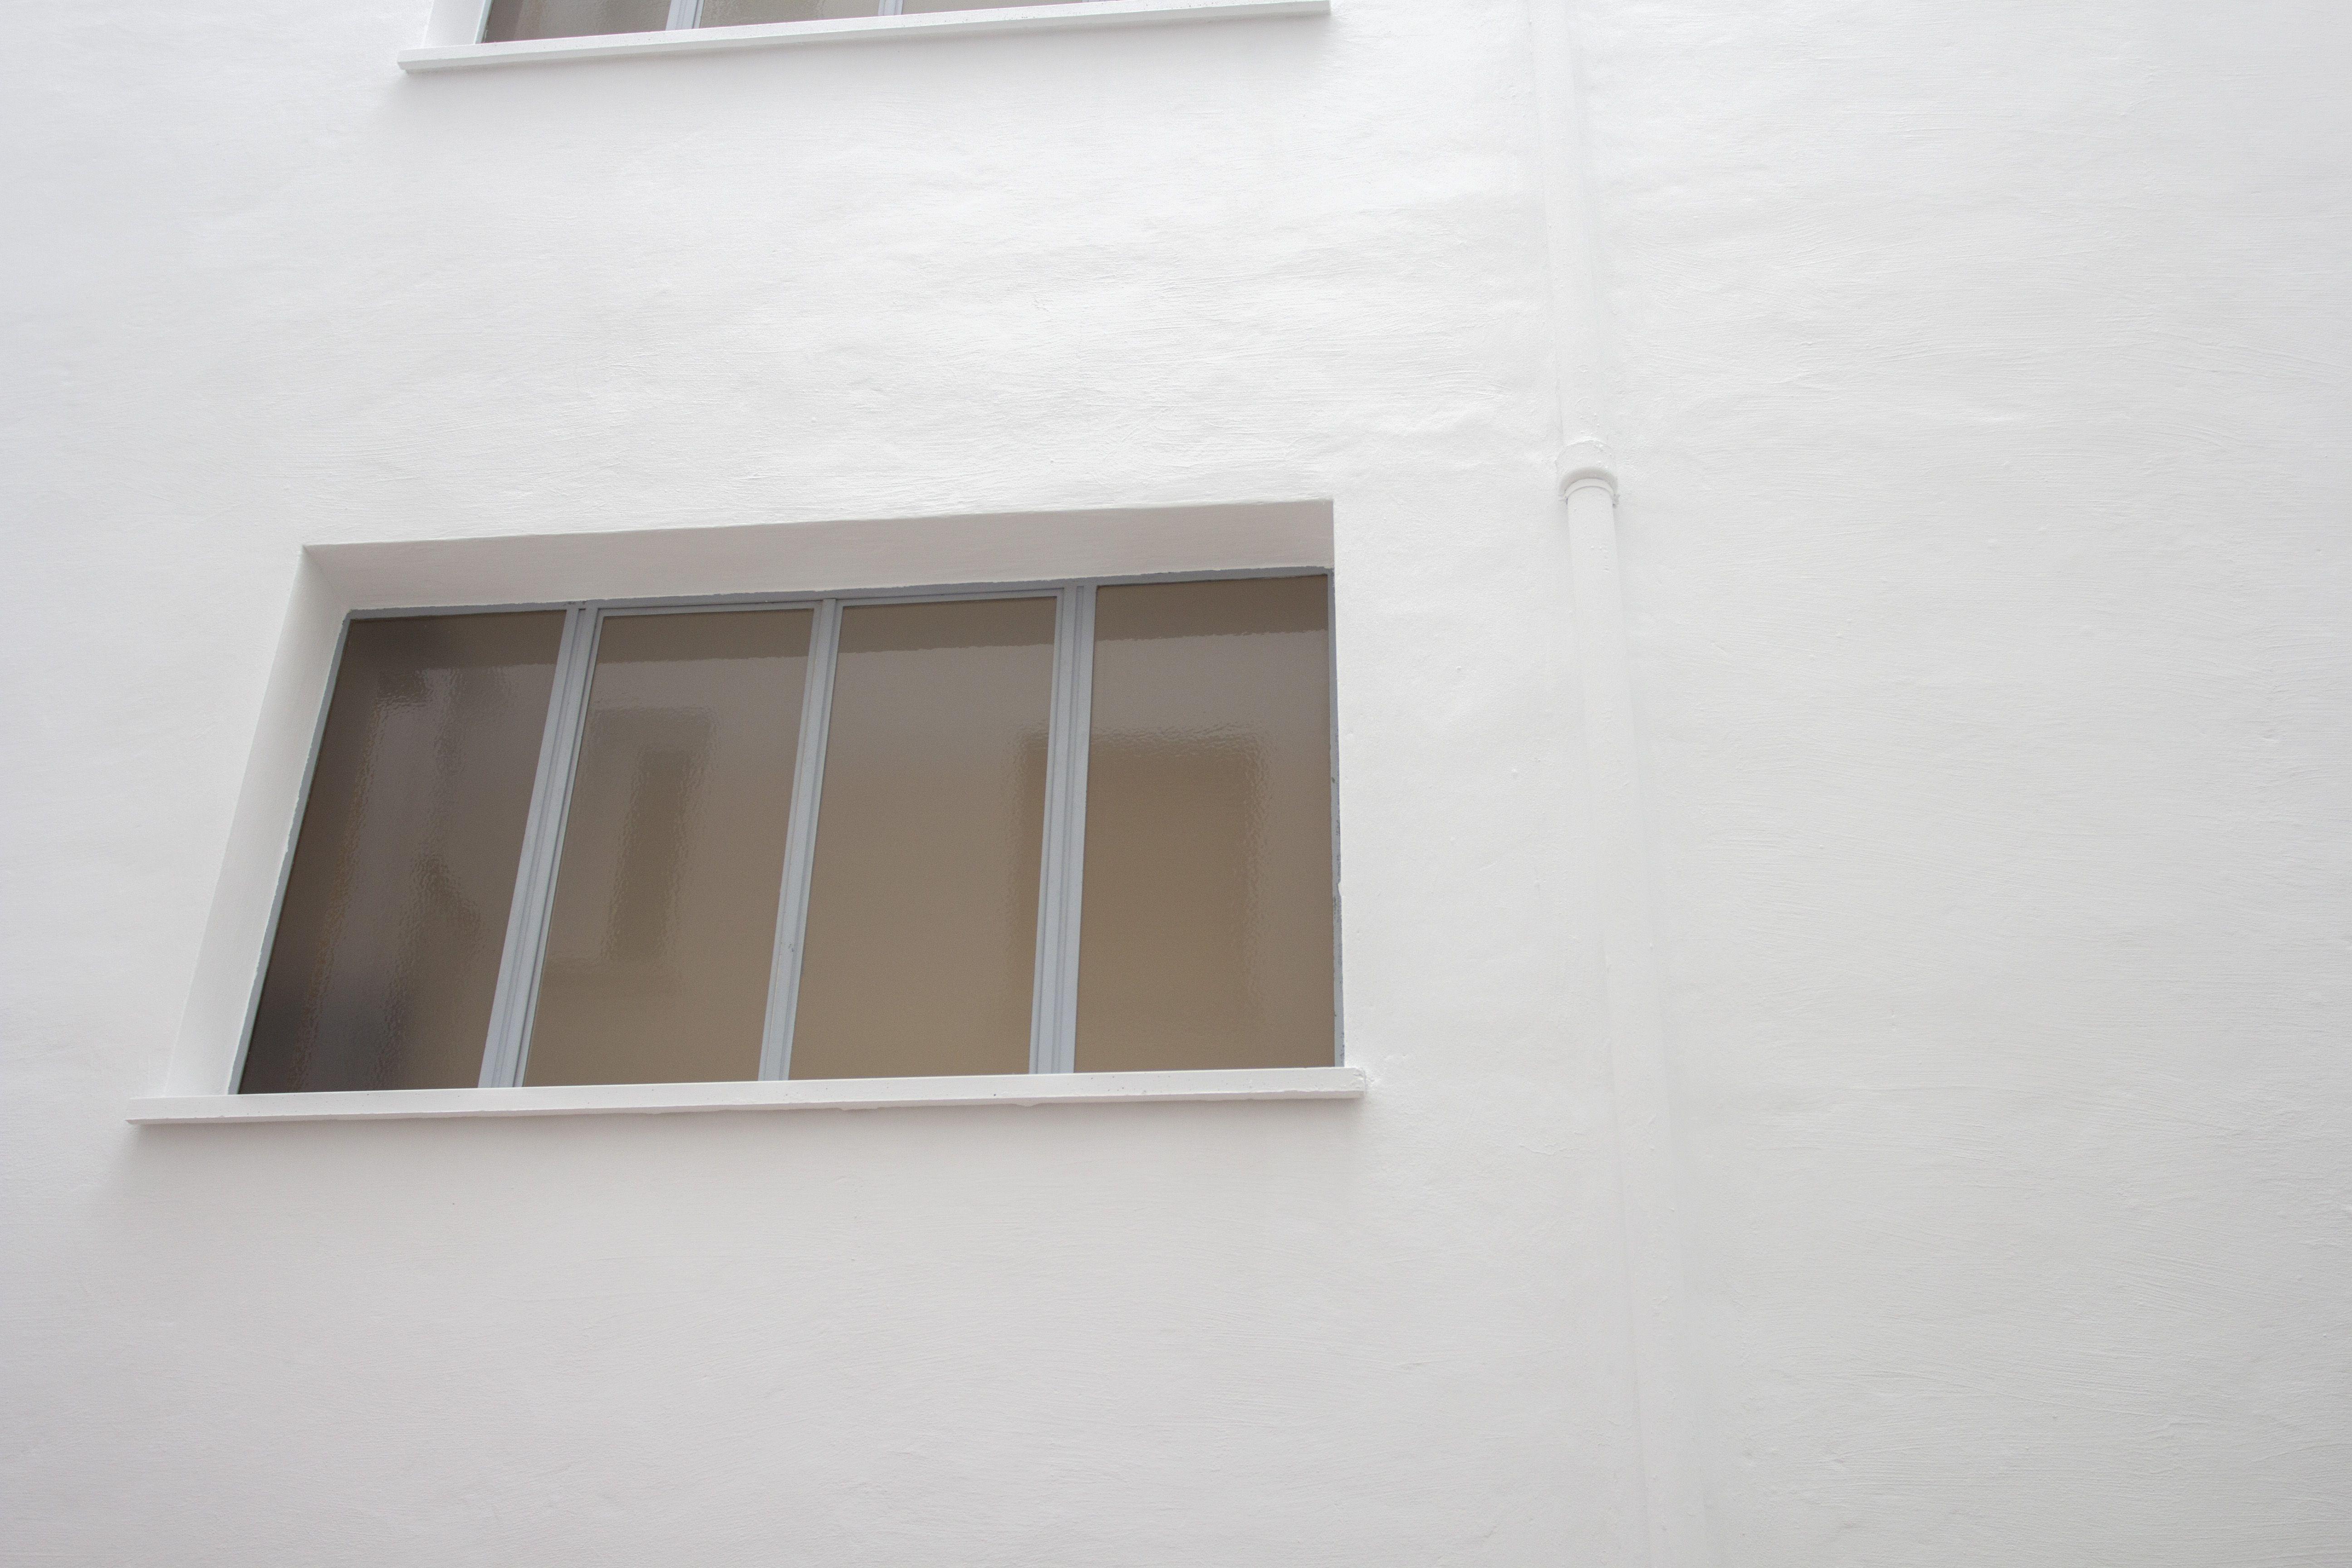 Pintura de fachadas sin andamios en Logroño